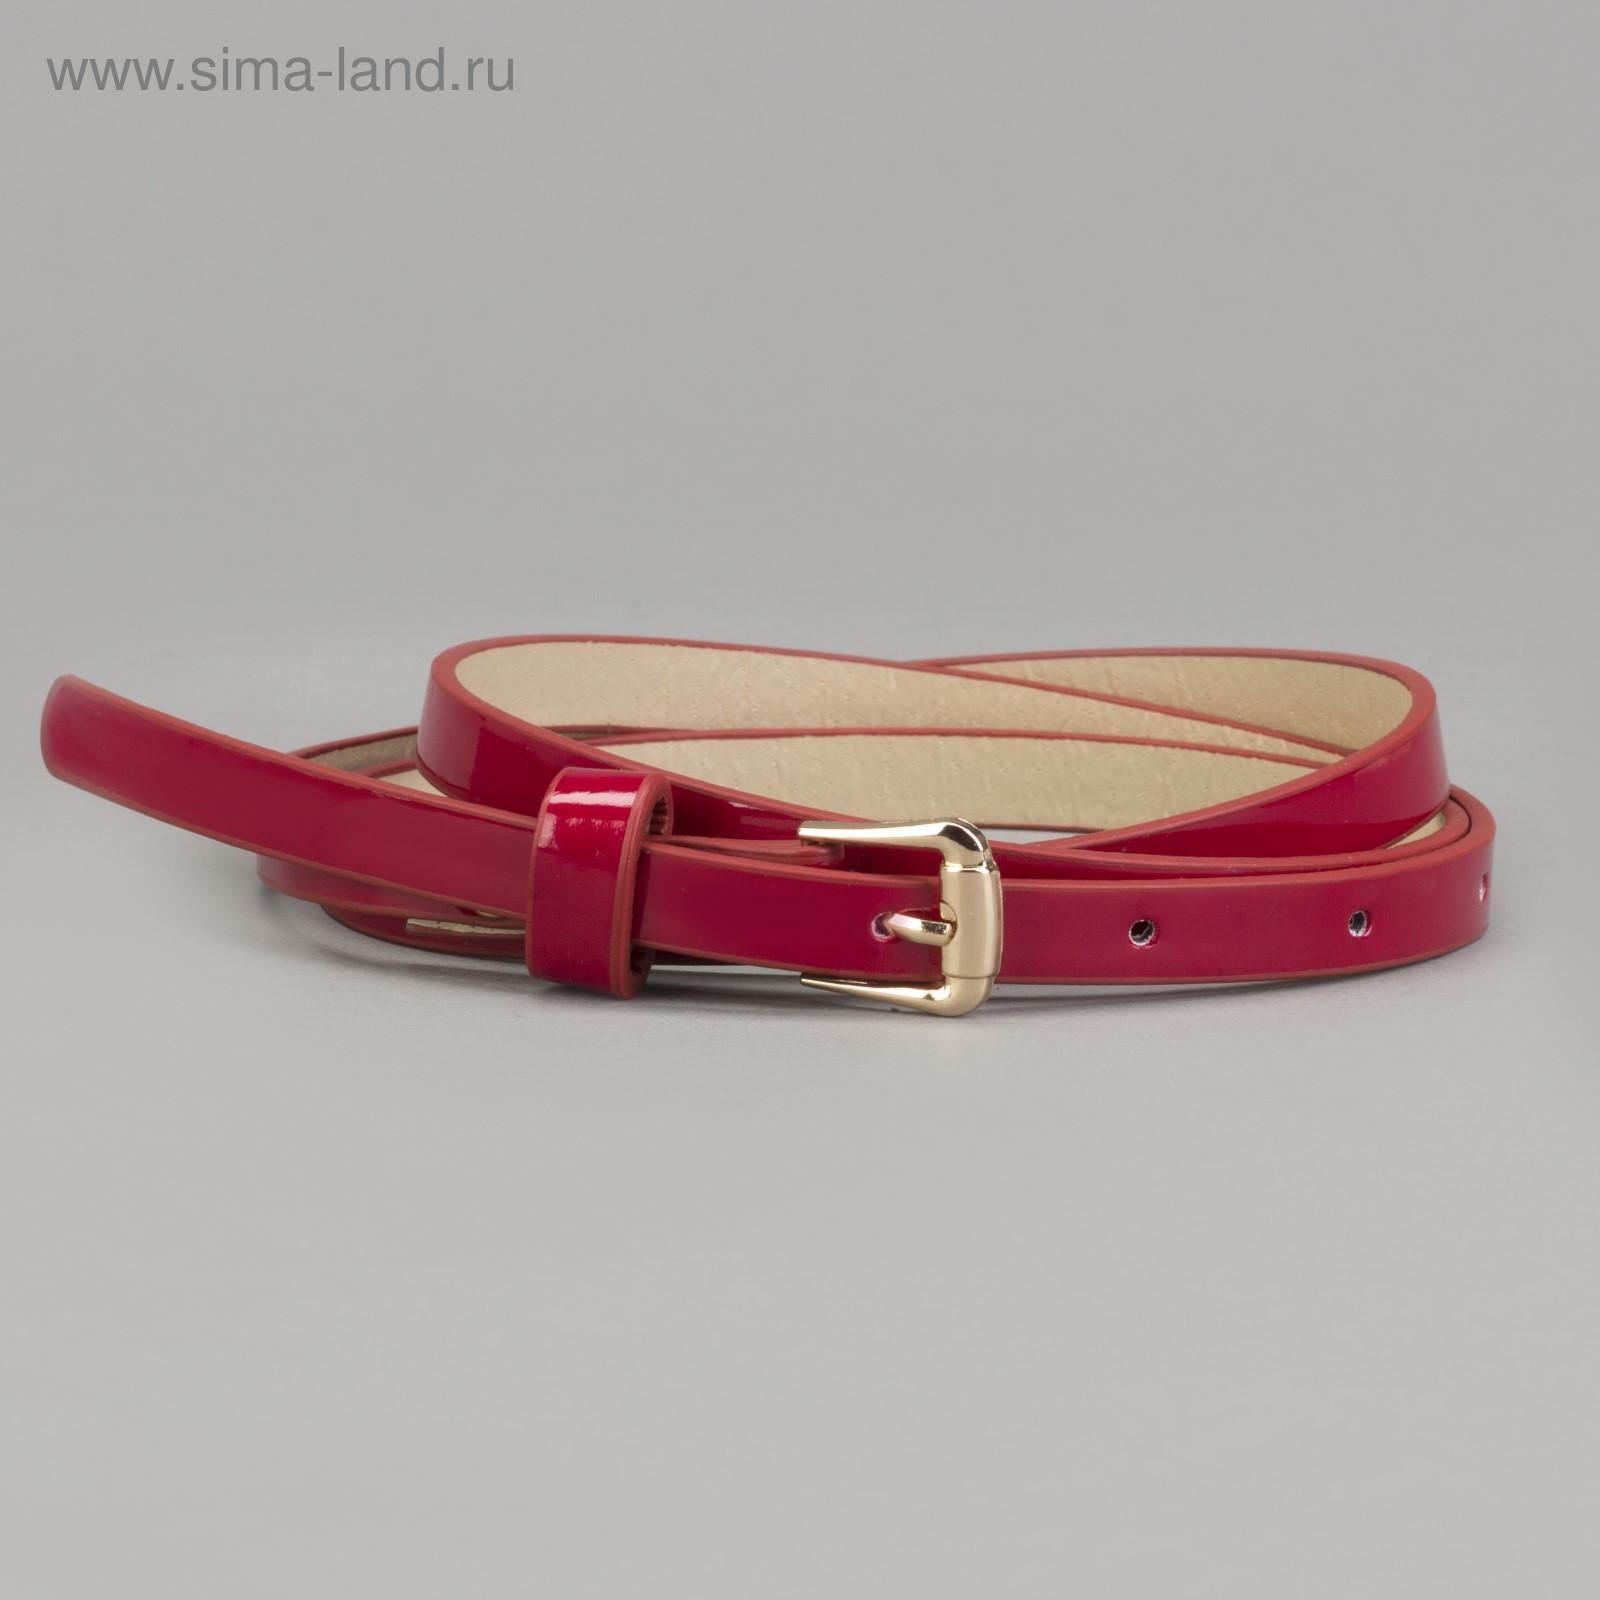 2d83ce96e10f Ремень женский, пряжка золото, ширина - 1 см, цвет бордовый (3722561 ...